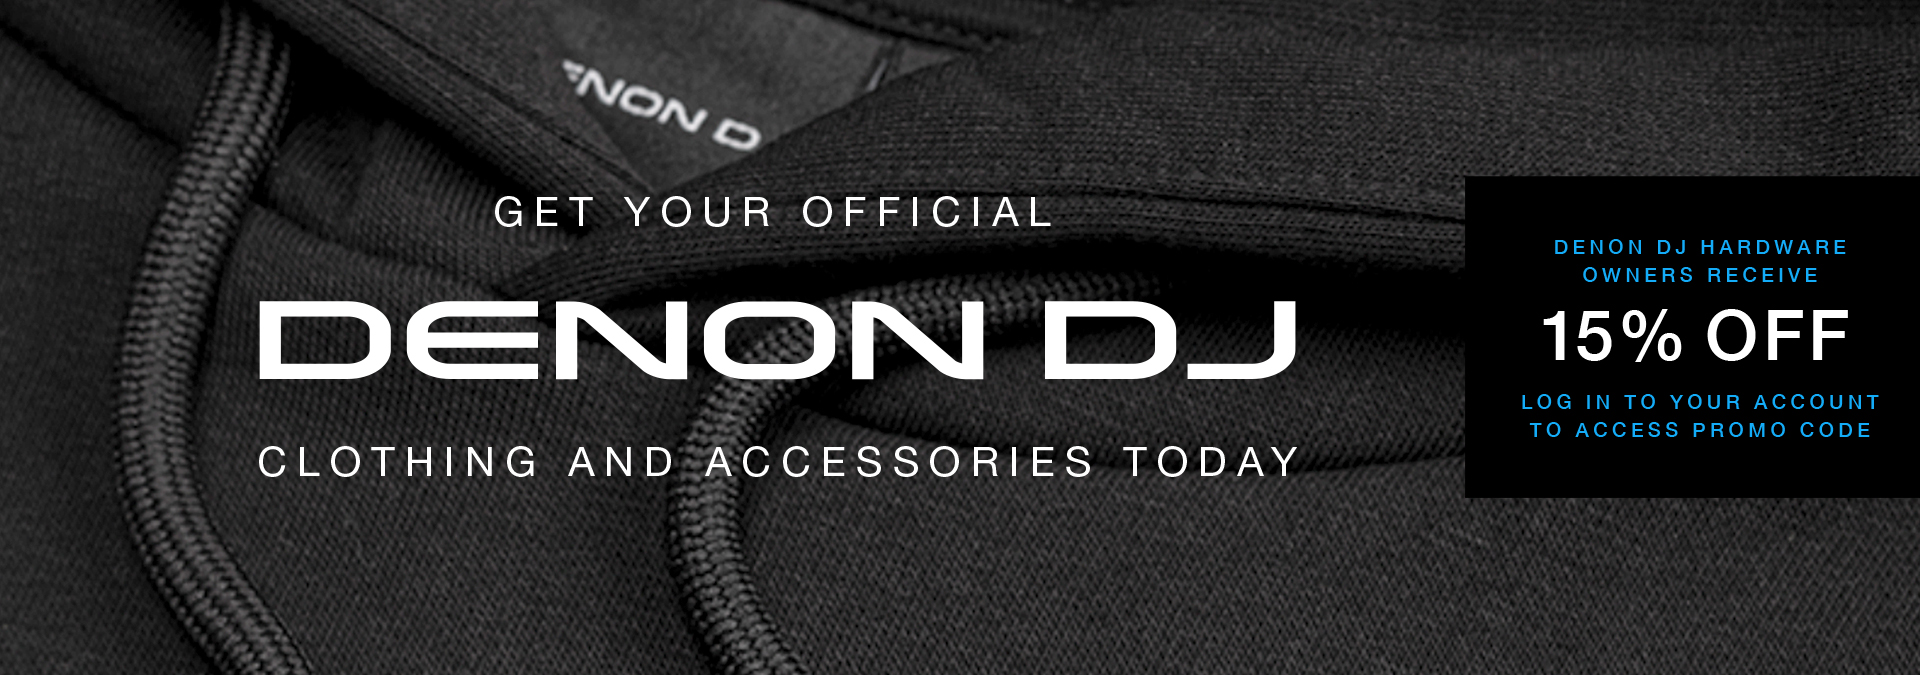 Denon DJ Merch